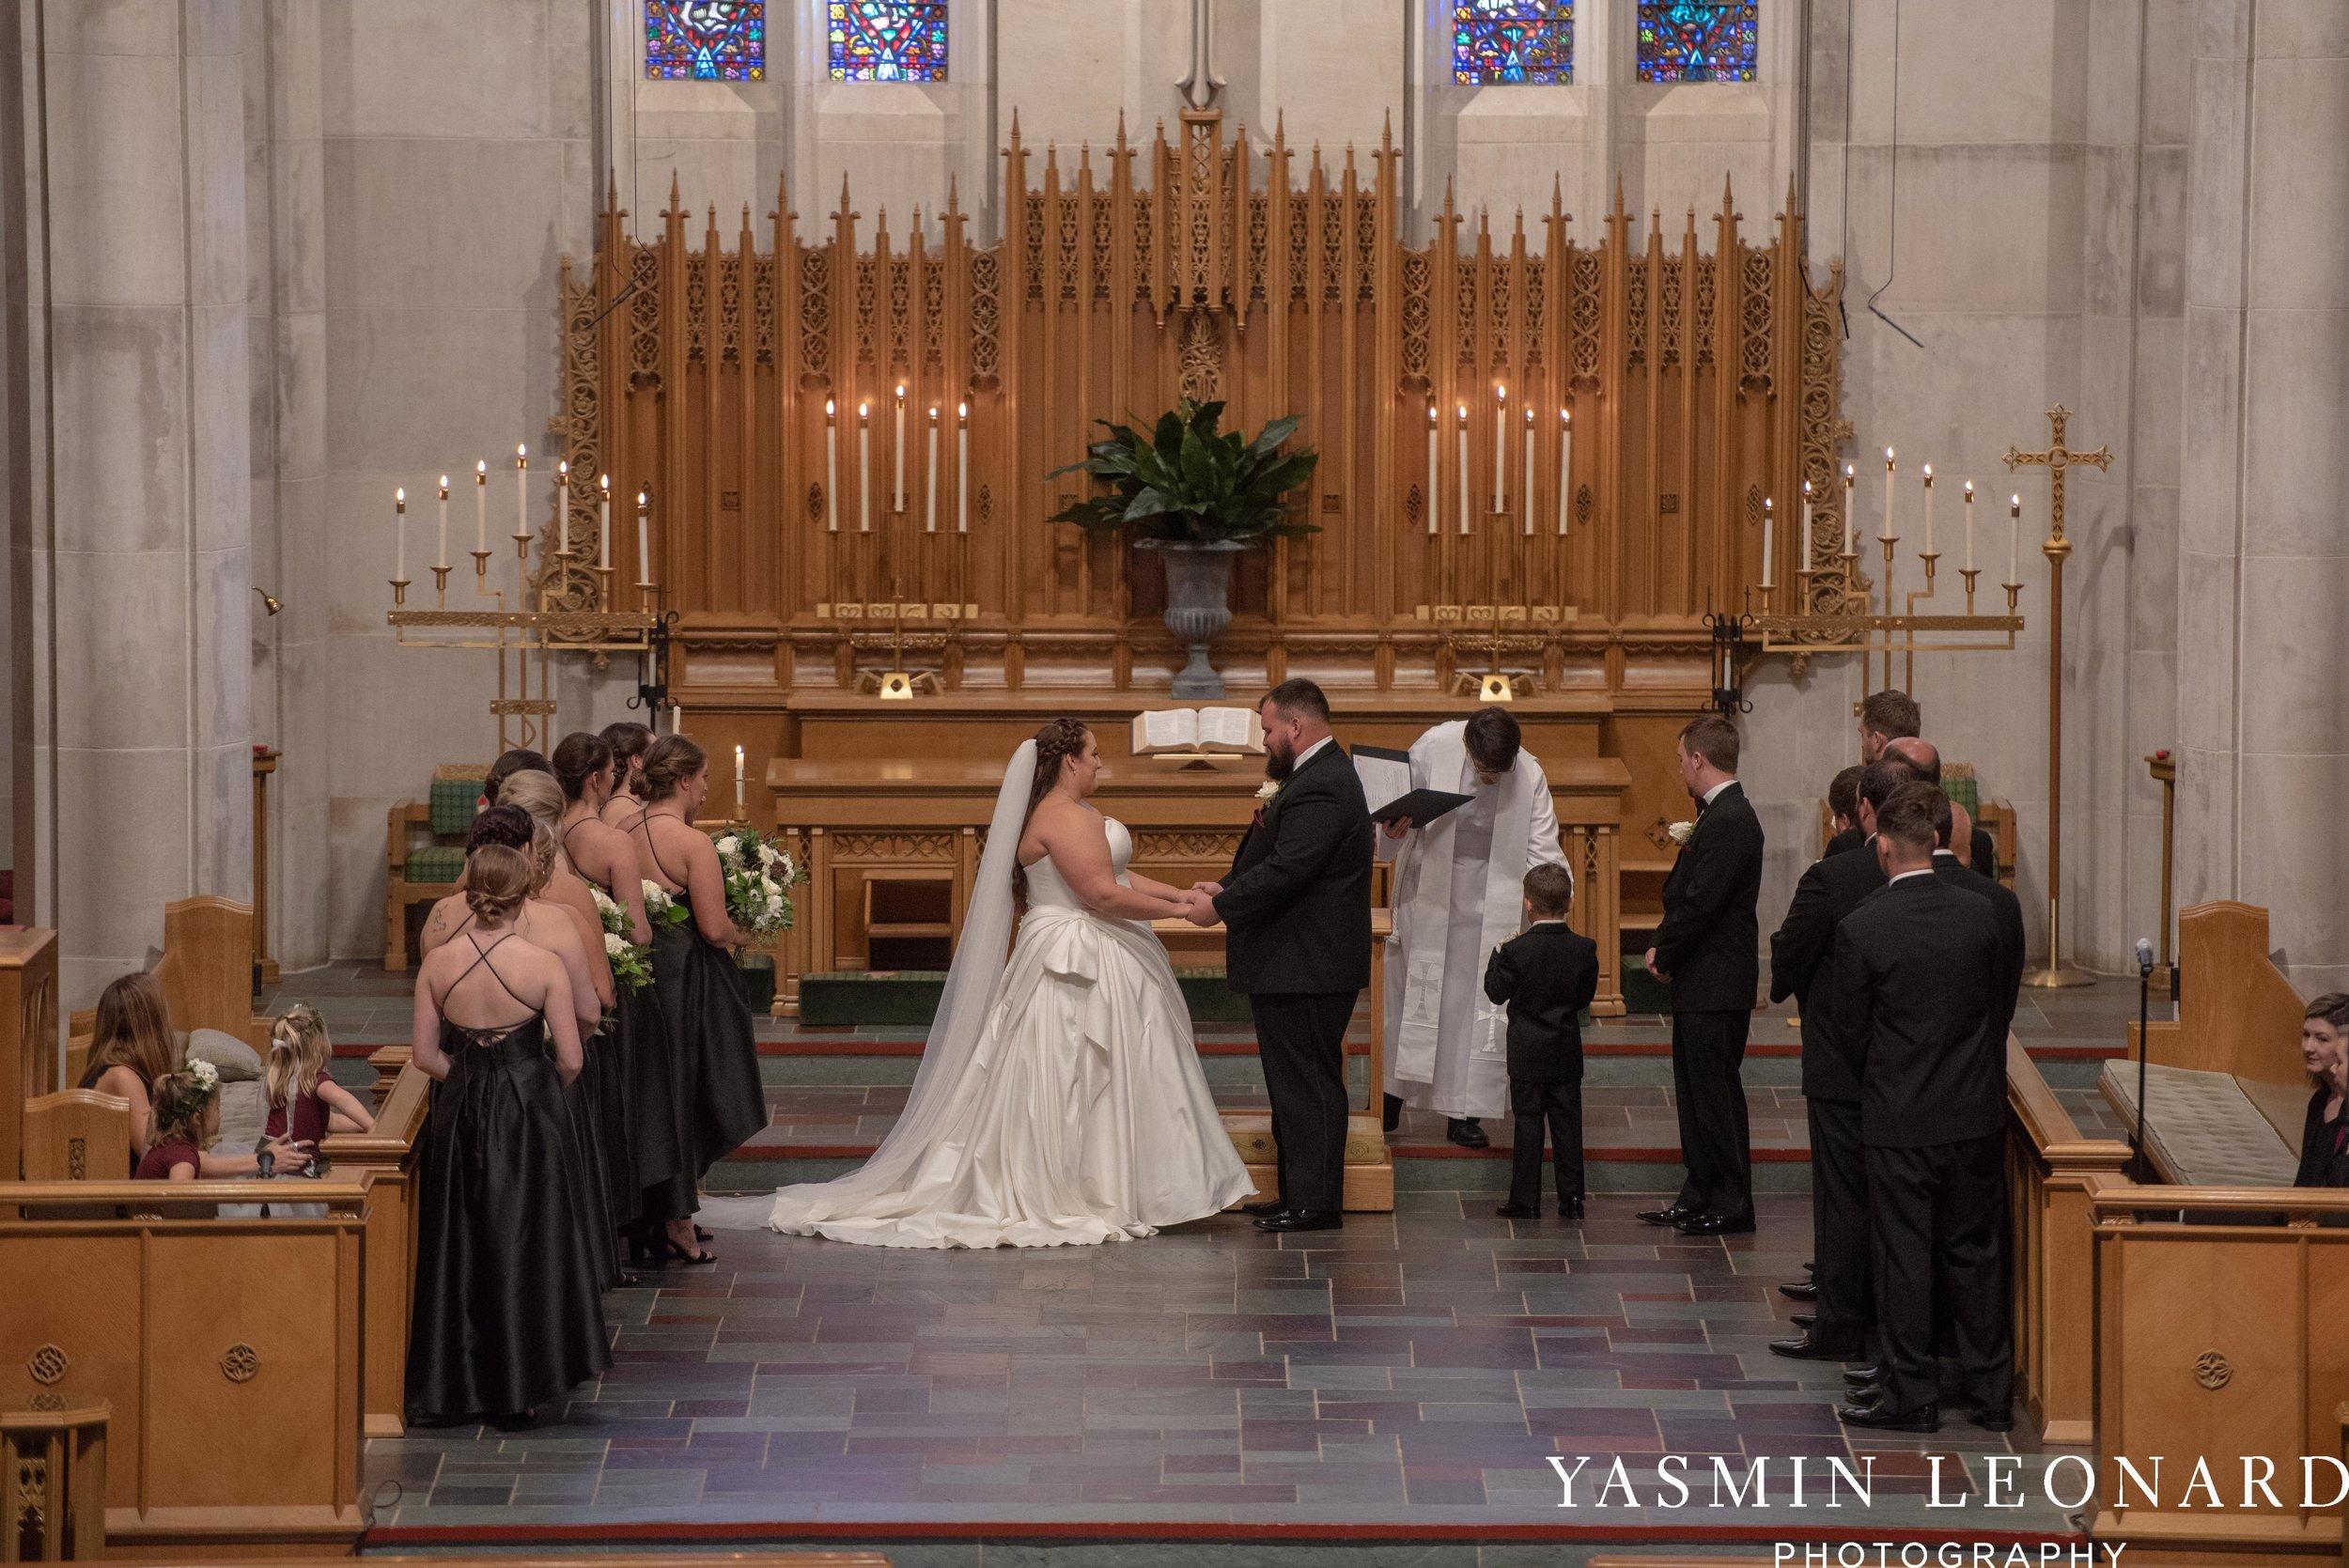 Wesley Memorial United Methodist Church - Old Homeplace Winery - High Point Weddings - High Point Wedding Photographer - NC Weddings - NC Barn Venue - Yasmin Leonard Photography-17.jpg